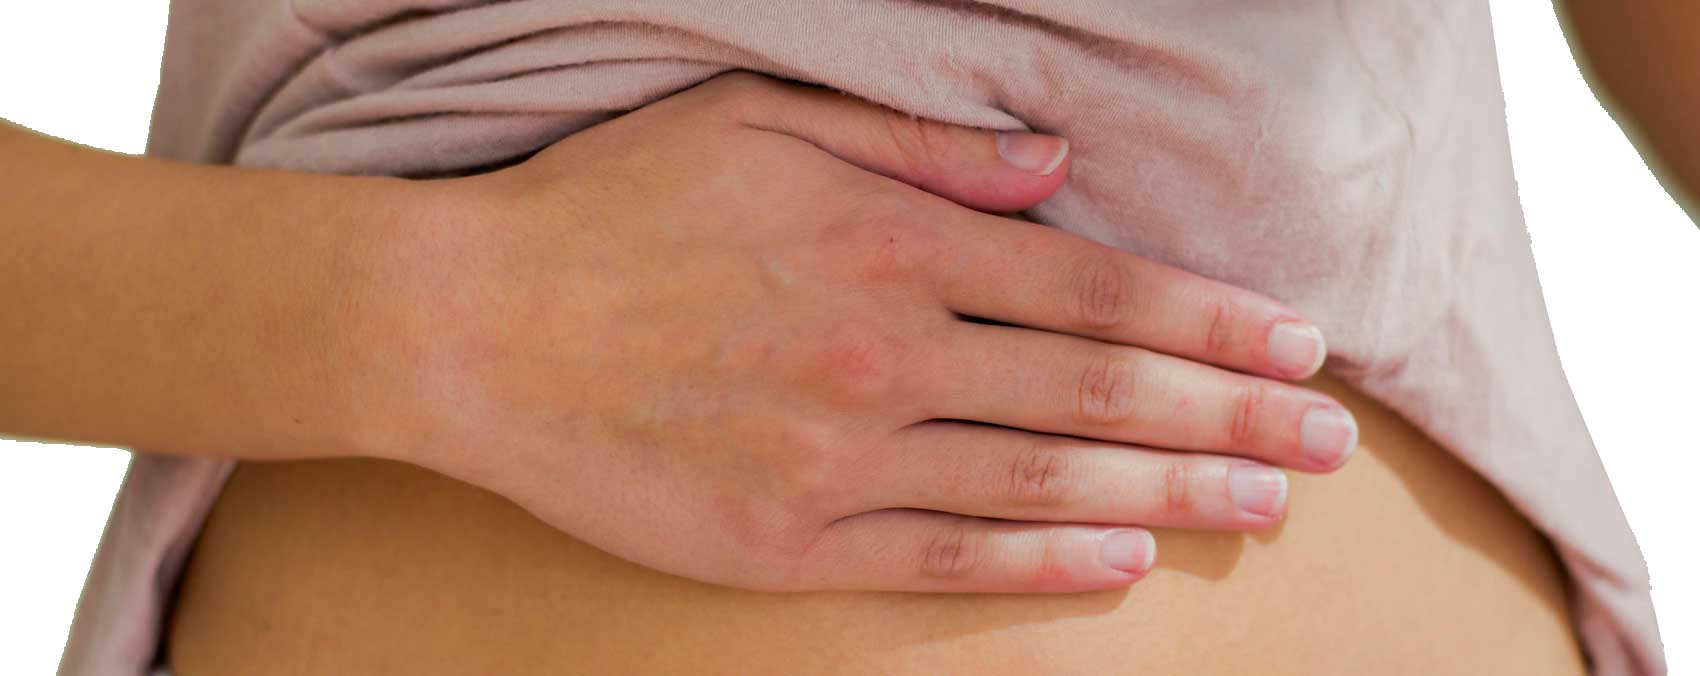 Dieta per intestino irritabile